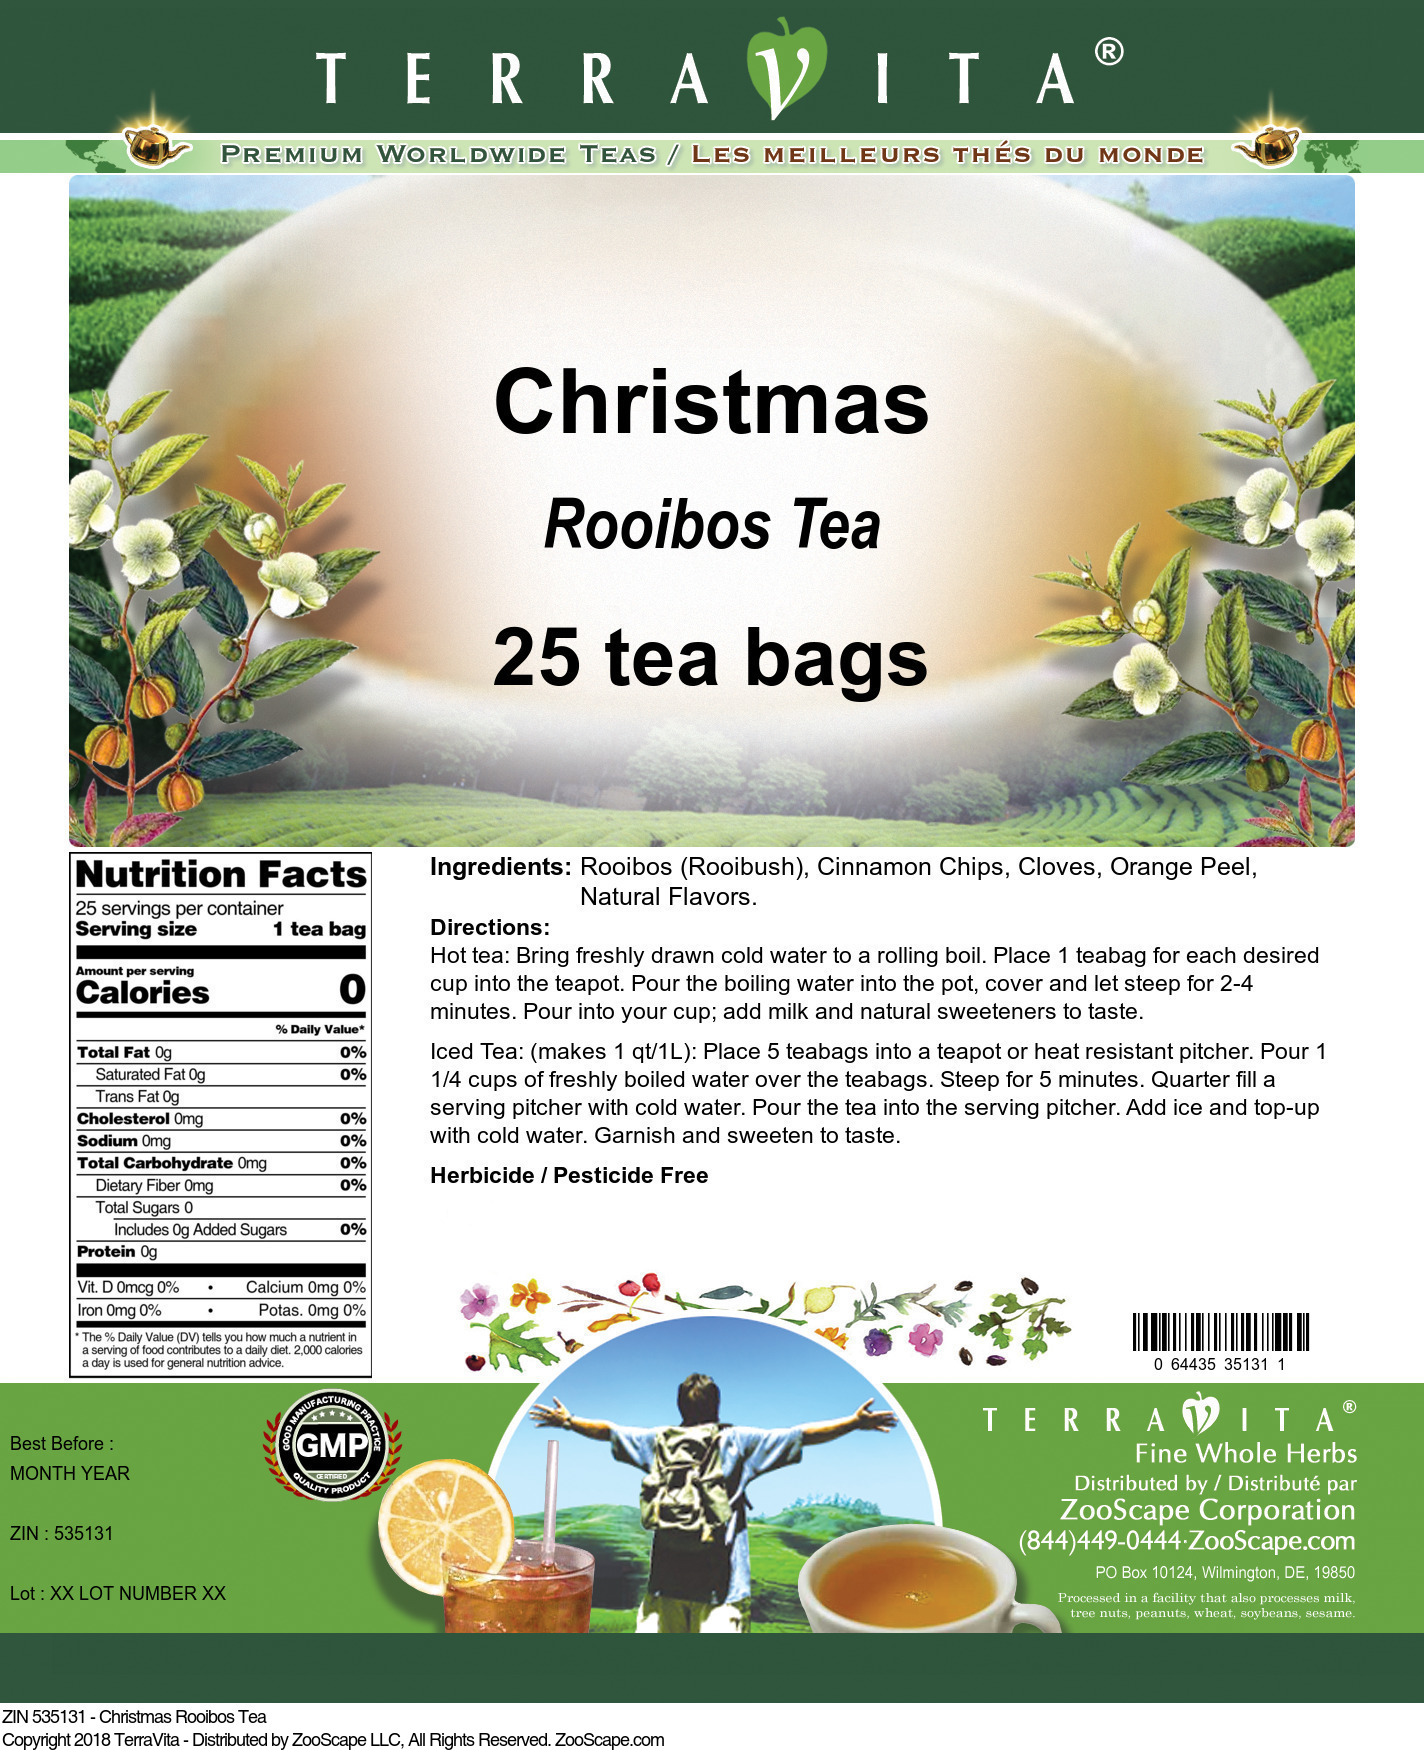 Christmas Rooibos Tea